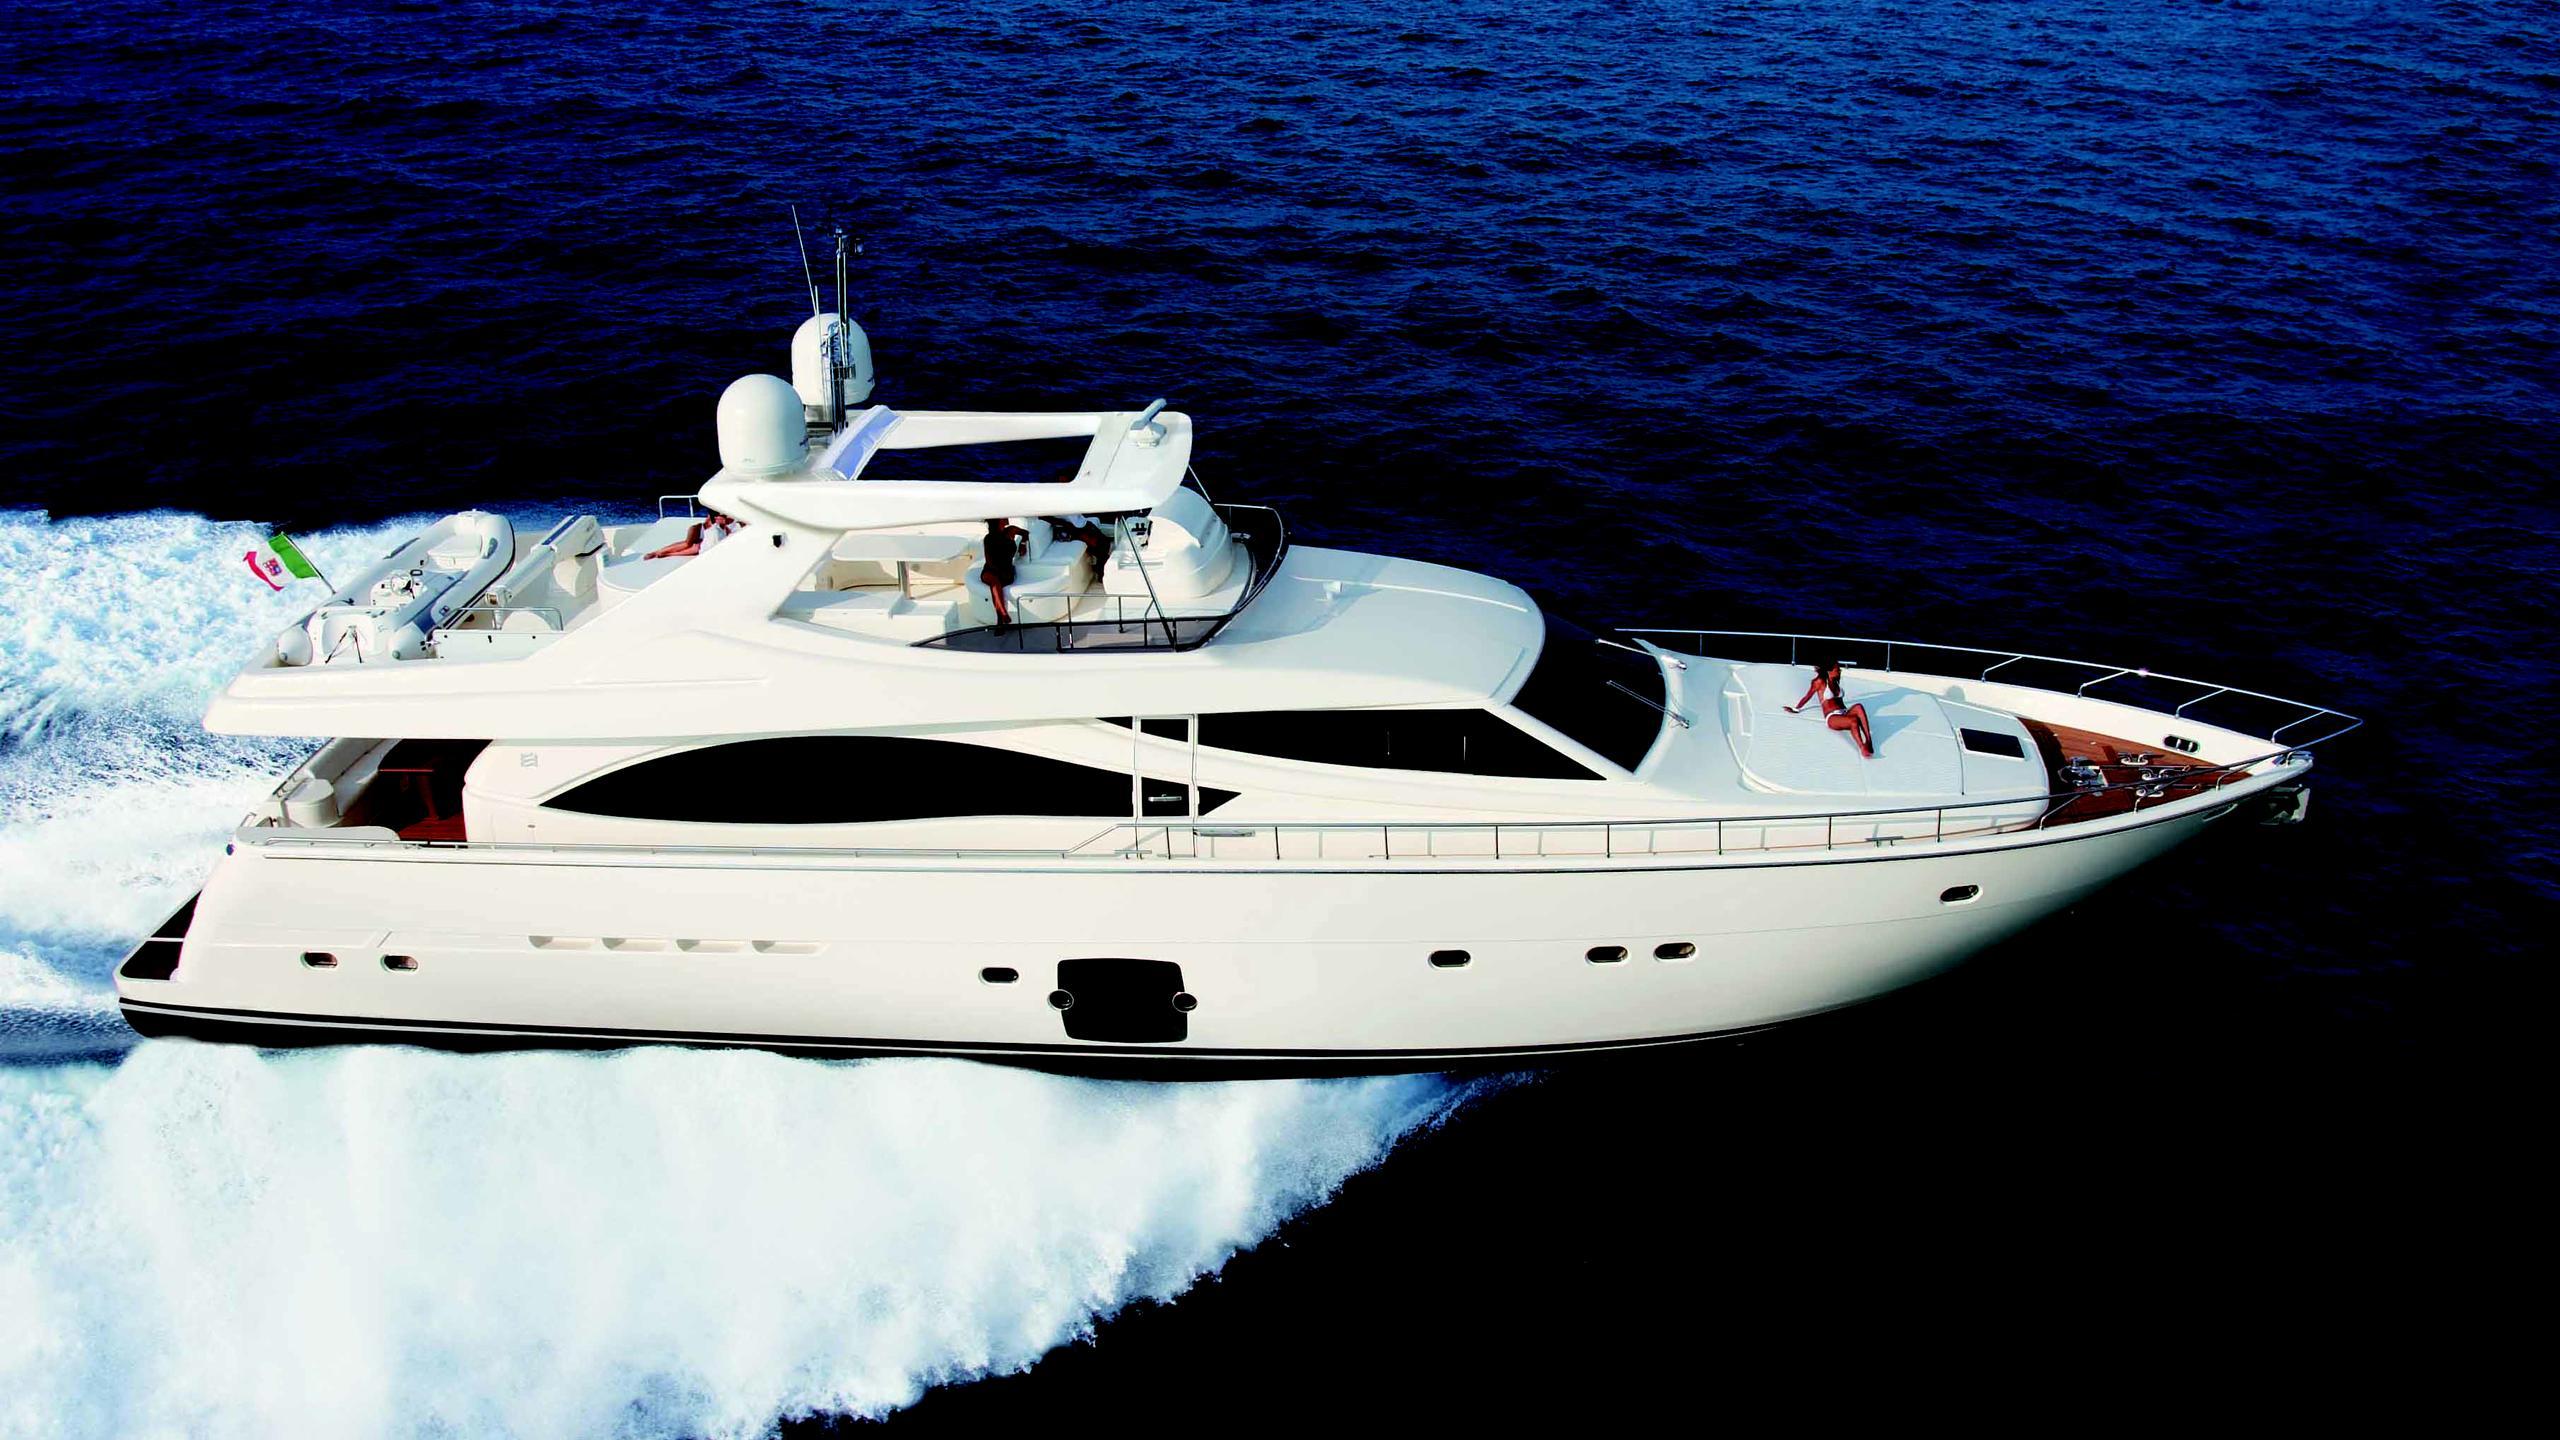 ferretti-830-22-motor-yacht-2006-25m-cruising